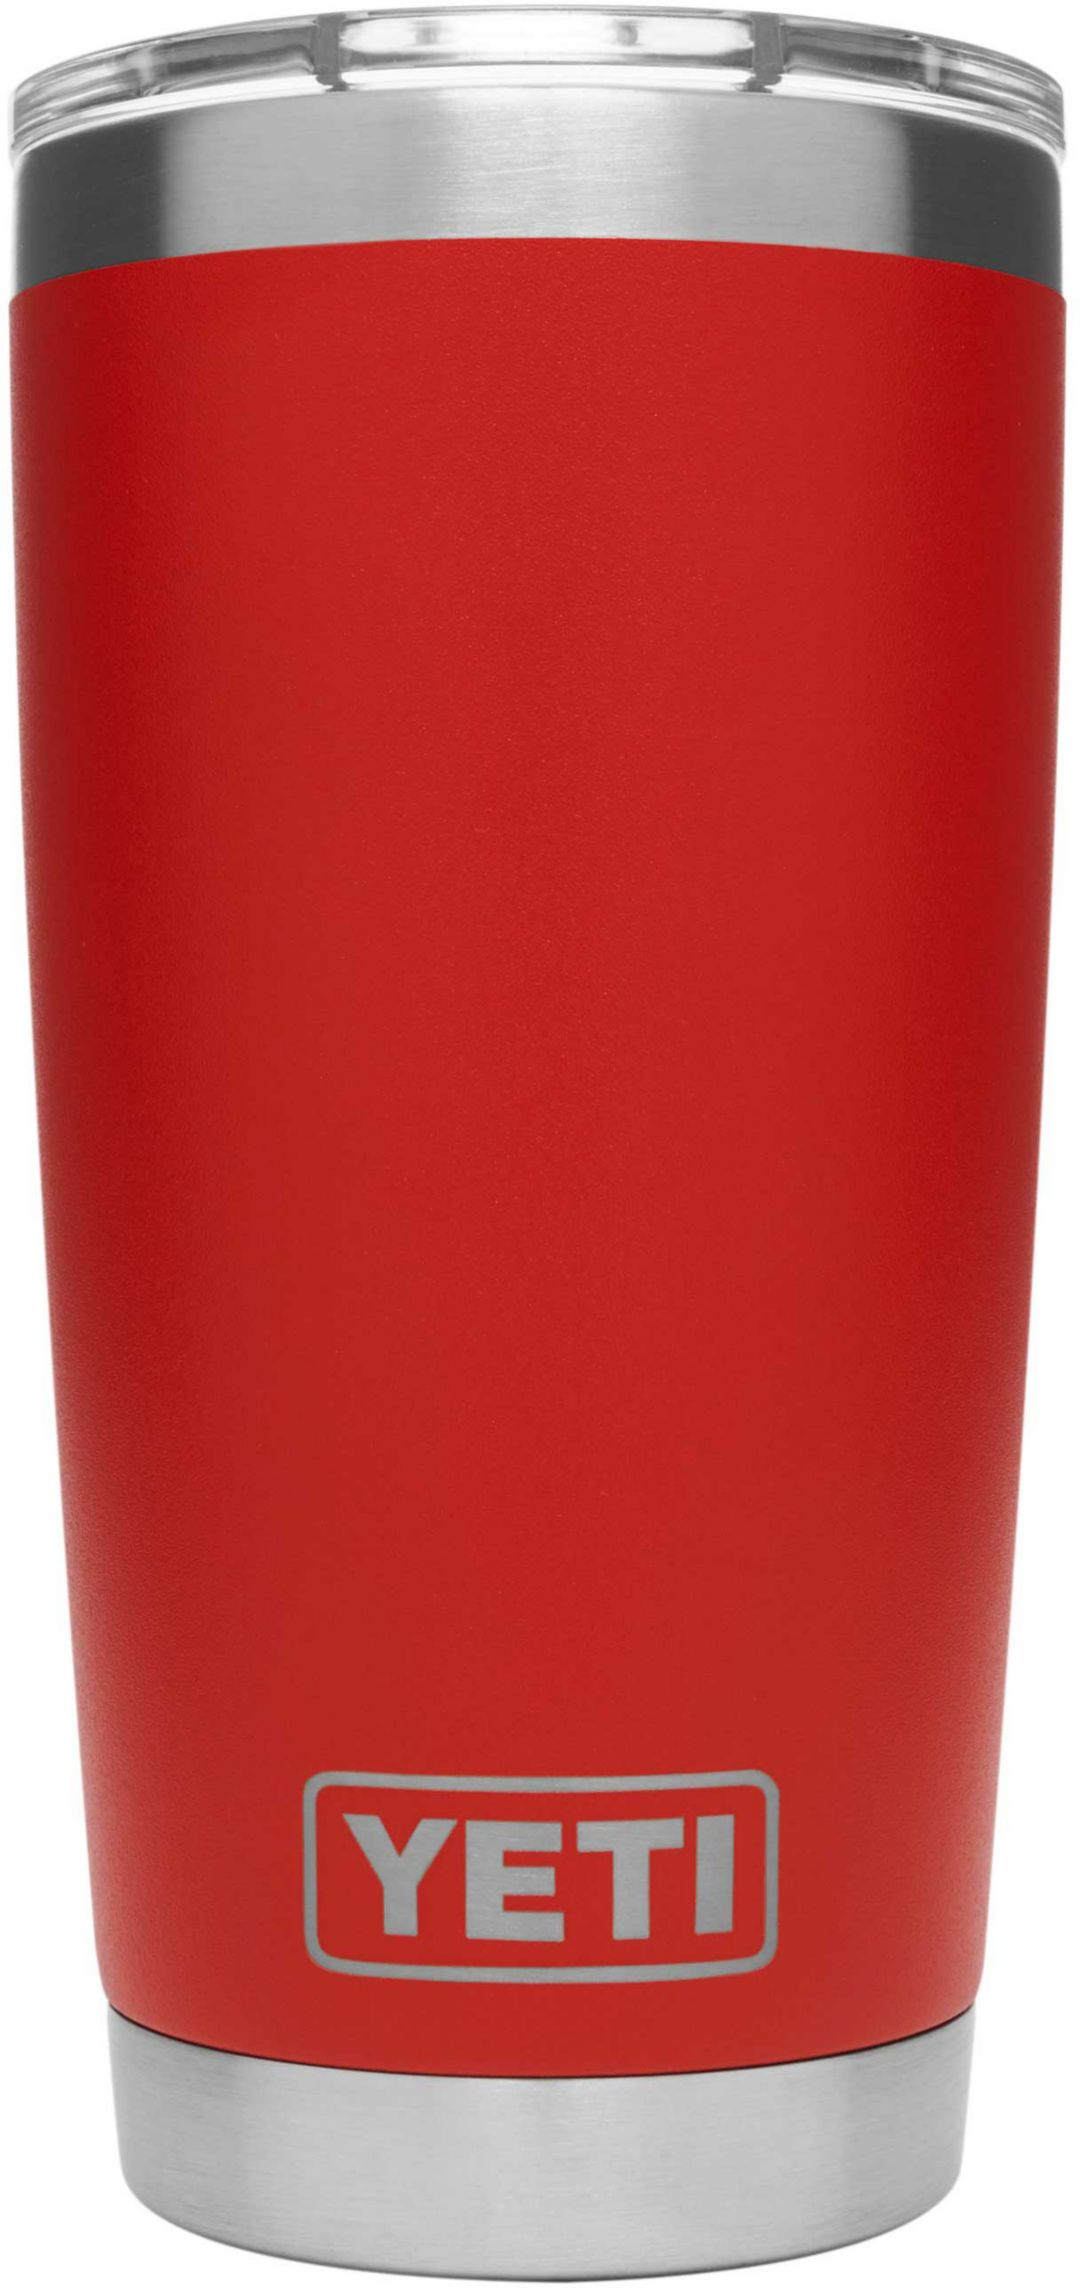 56d75a7b7dc YETI Rambler 20 oz. Tumbler | Best Price Guarantee at DICK'S